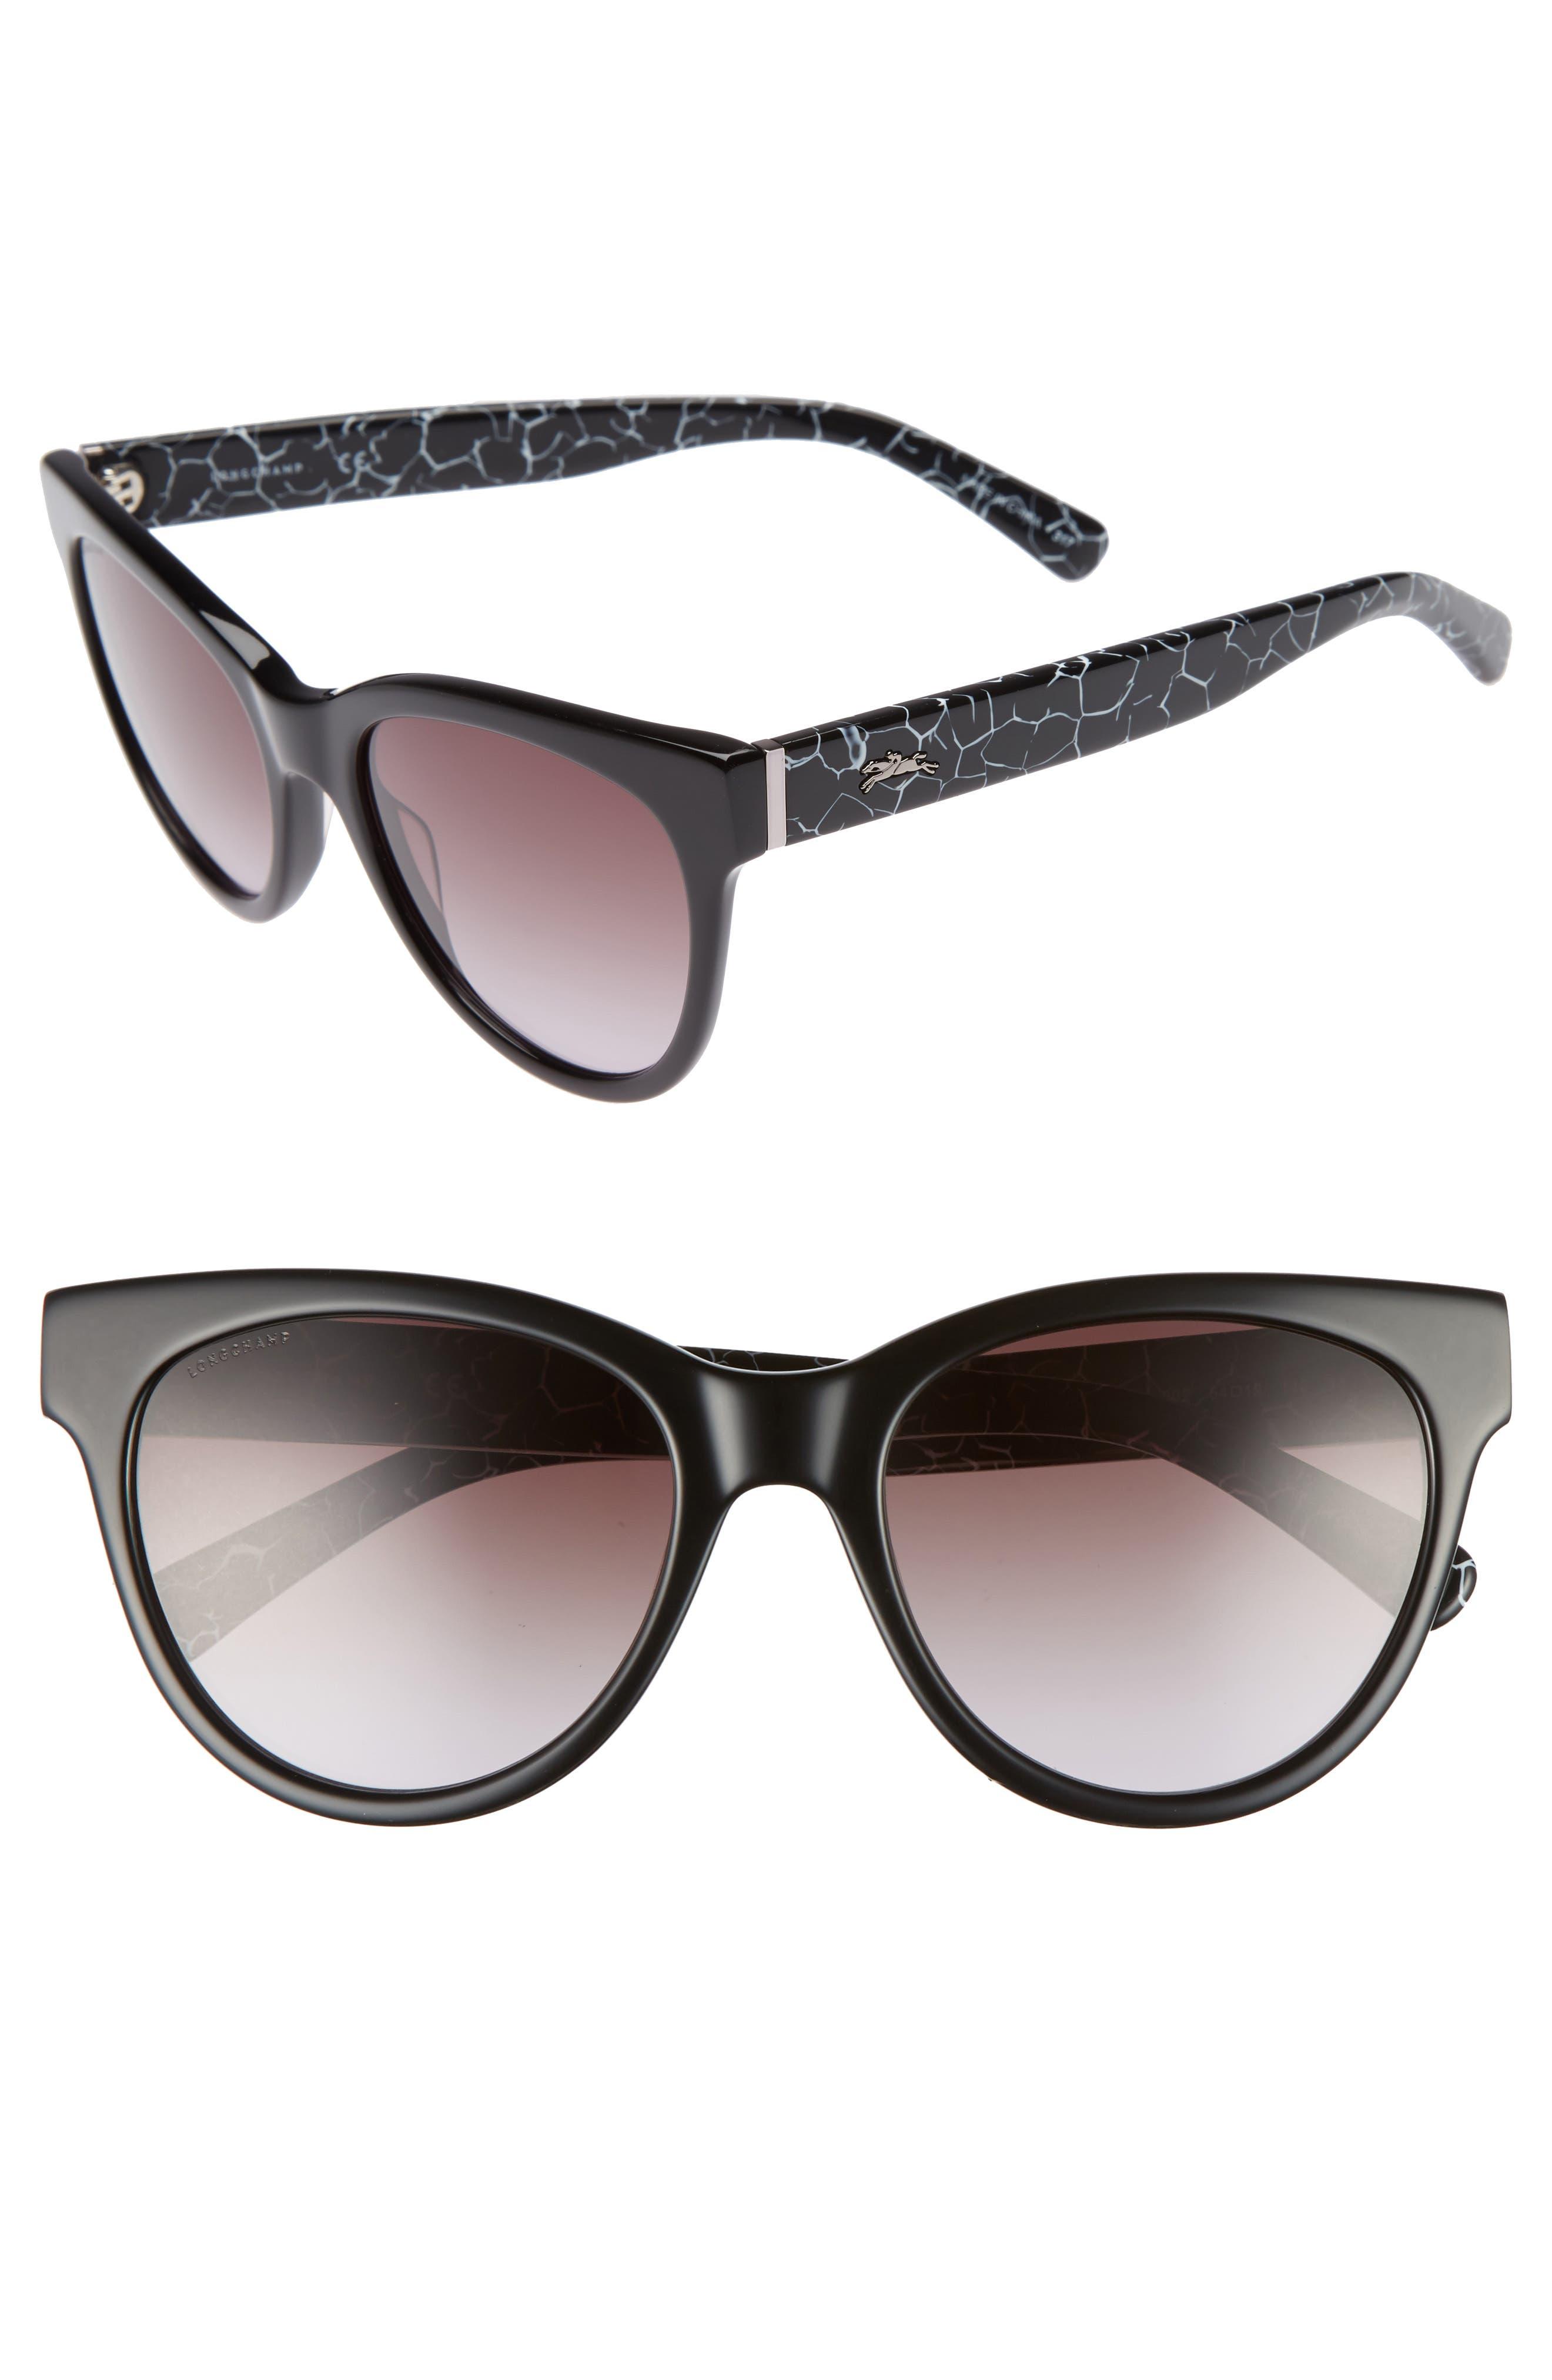 6a583a7640 Longchamp 54Mm Gradient Lens Cat Eye Sunglasses - Marble Black ...